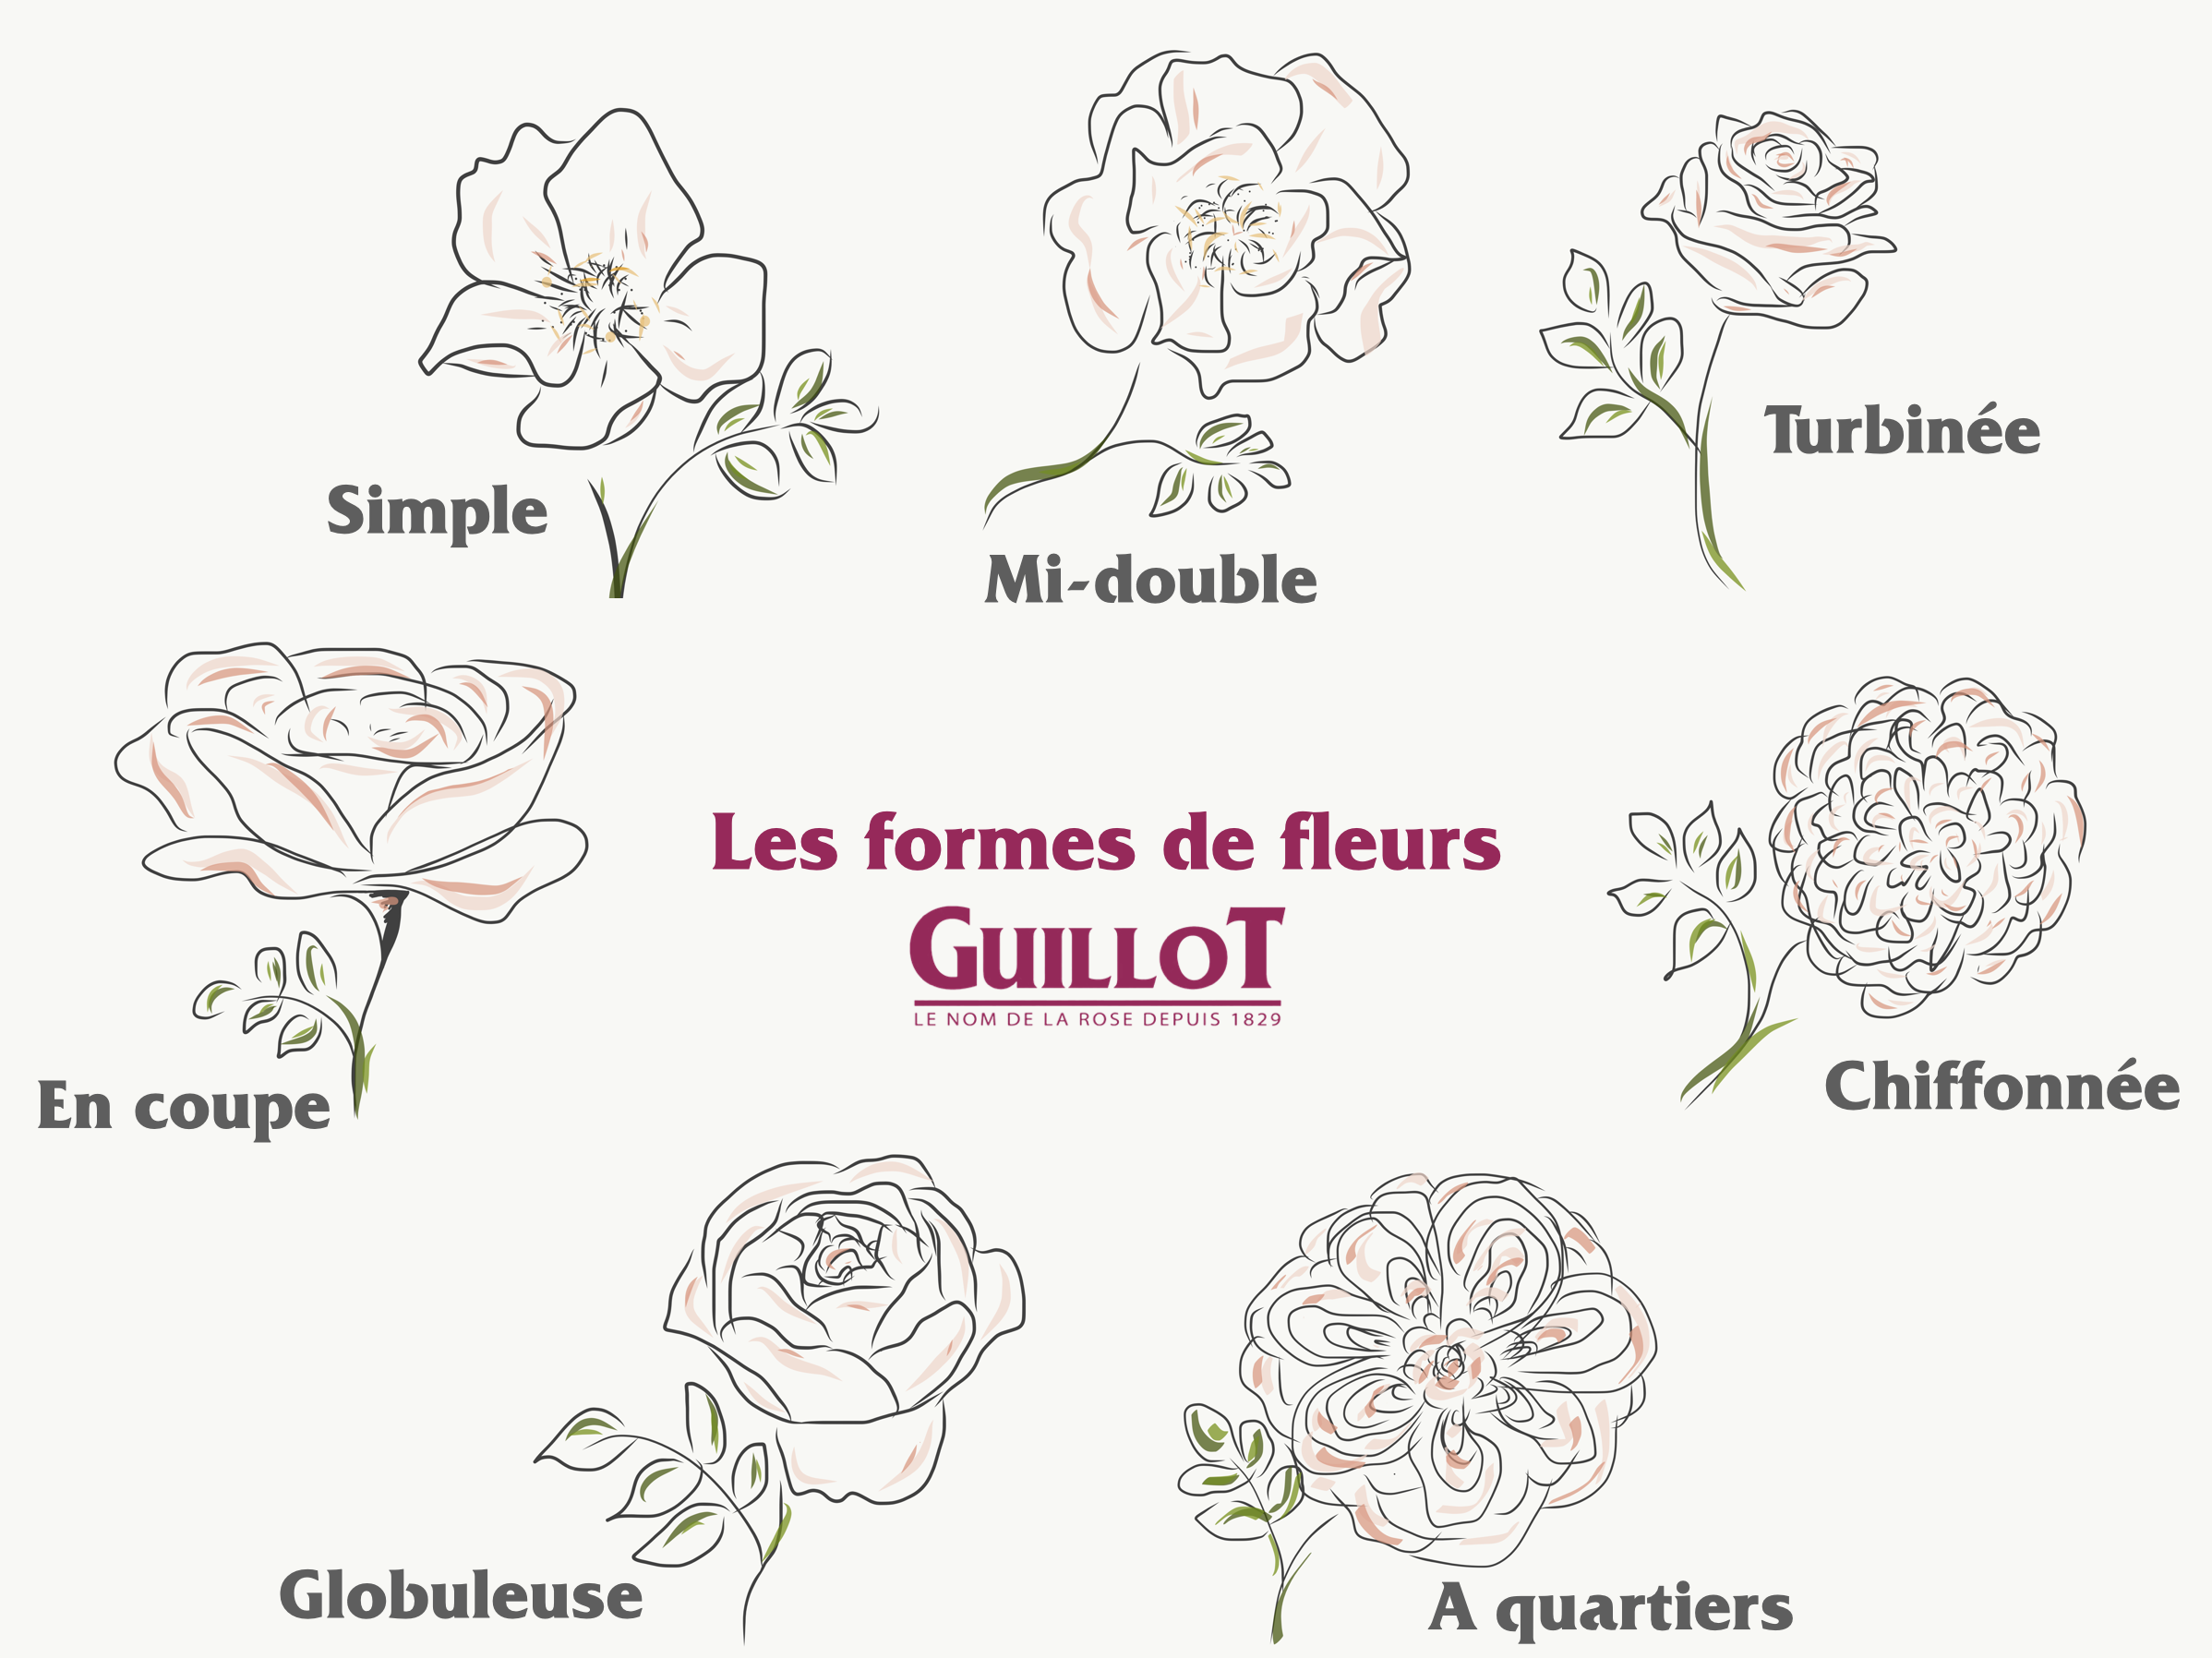 Les formes de fleurs - Roses Guillot®